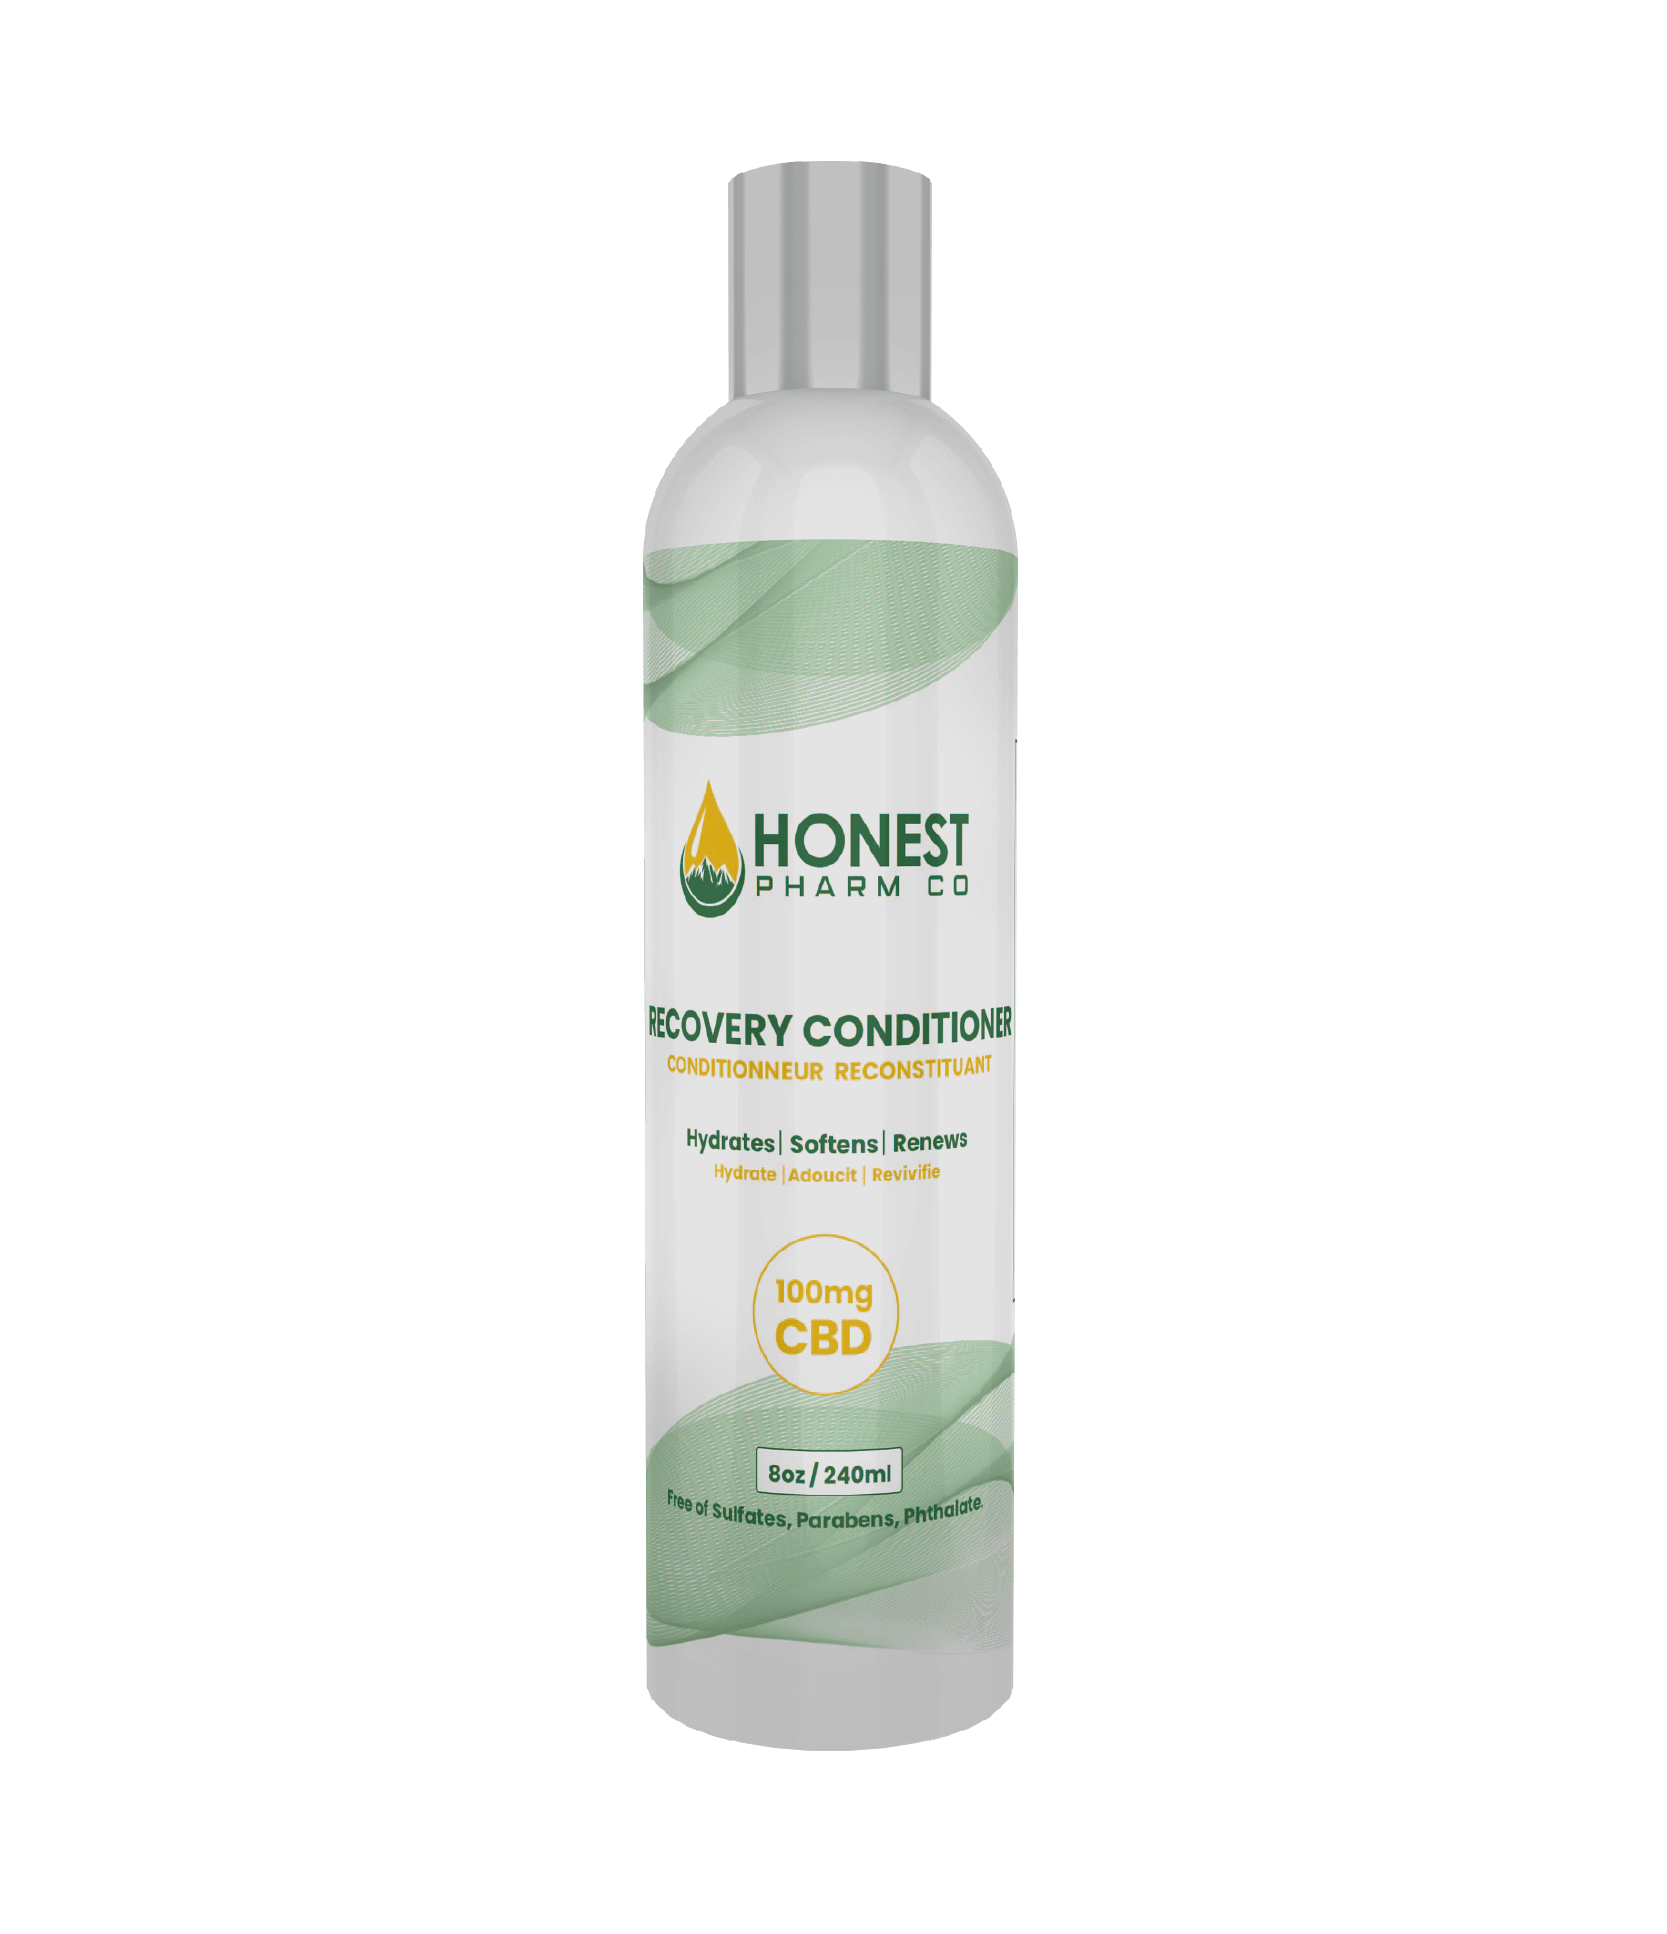 Honest Pharm Co. CBD Recovery Conditioner 8 oz. (100mg)